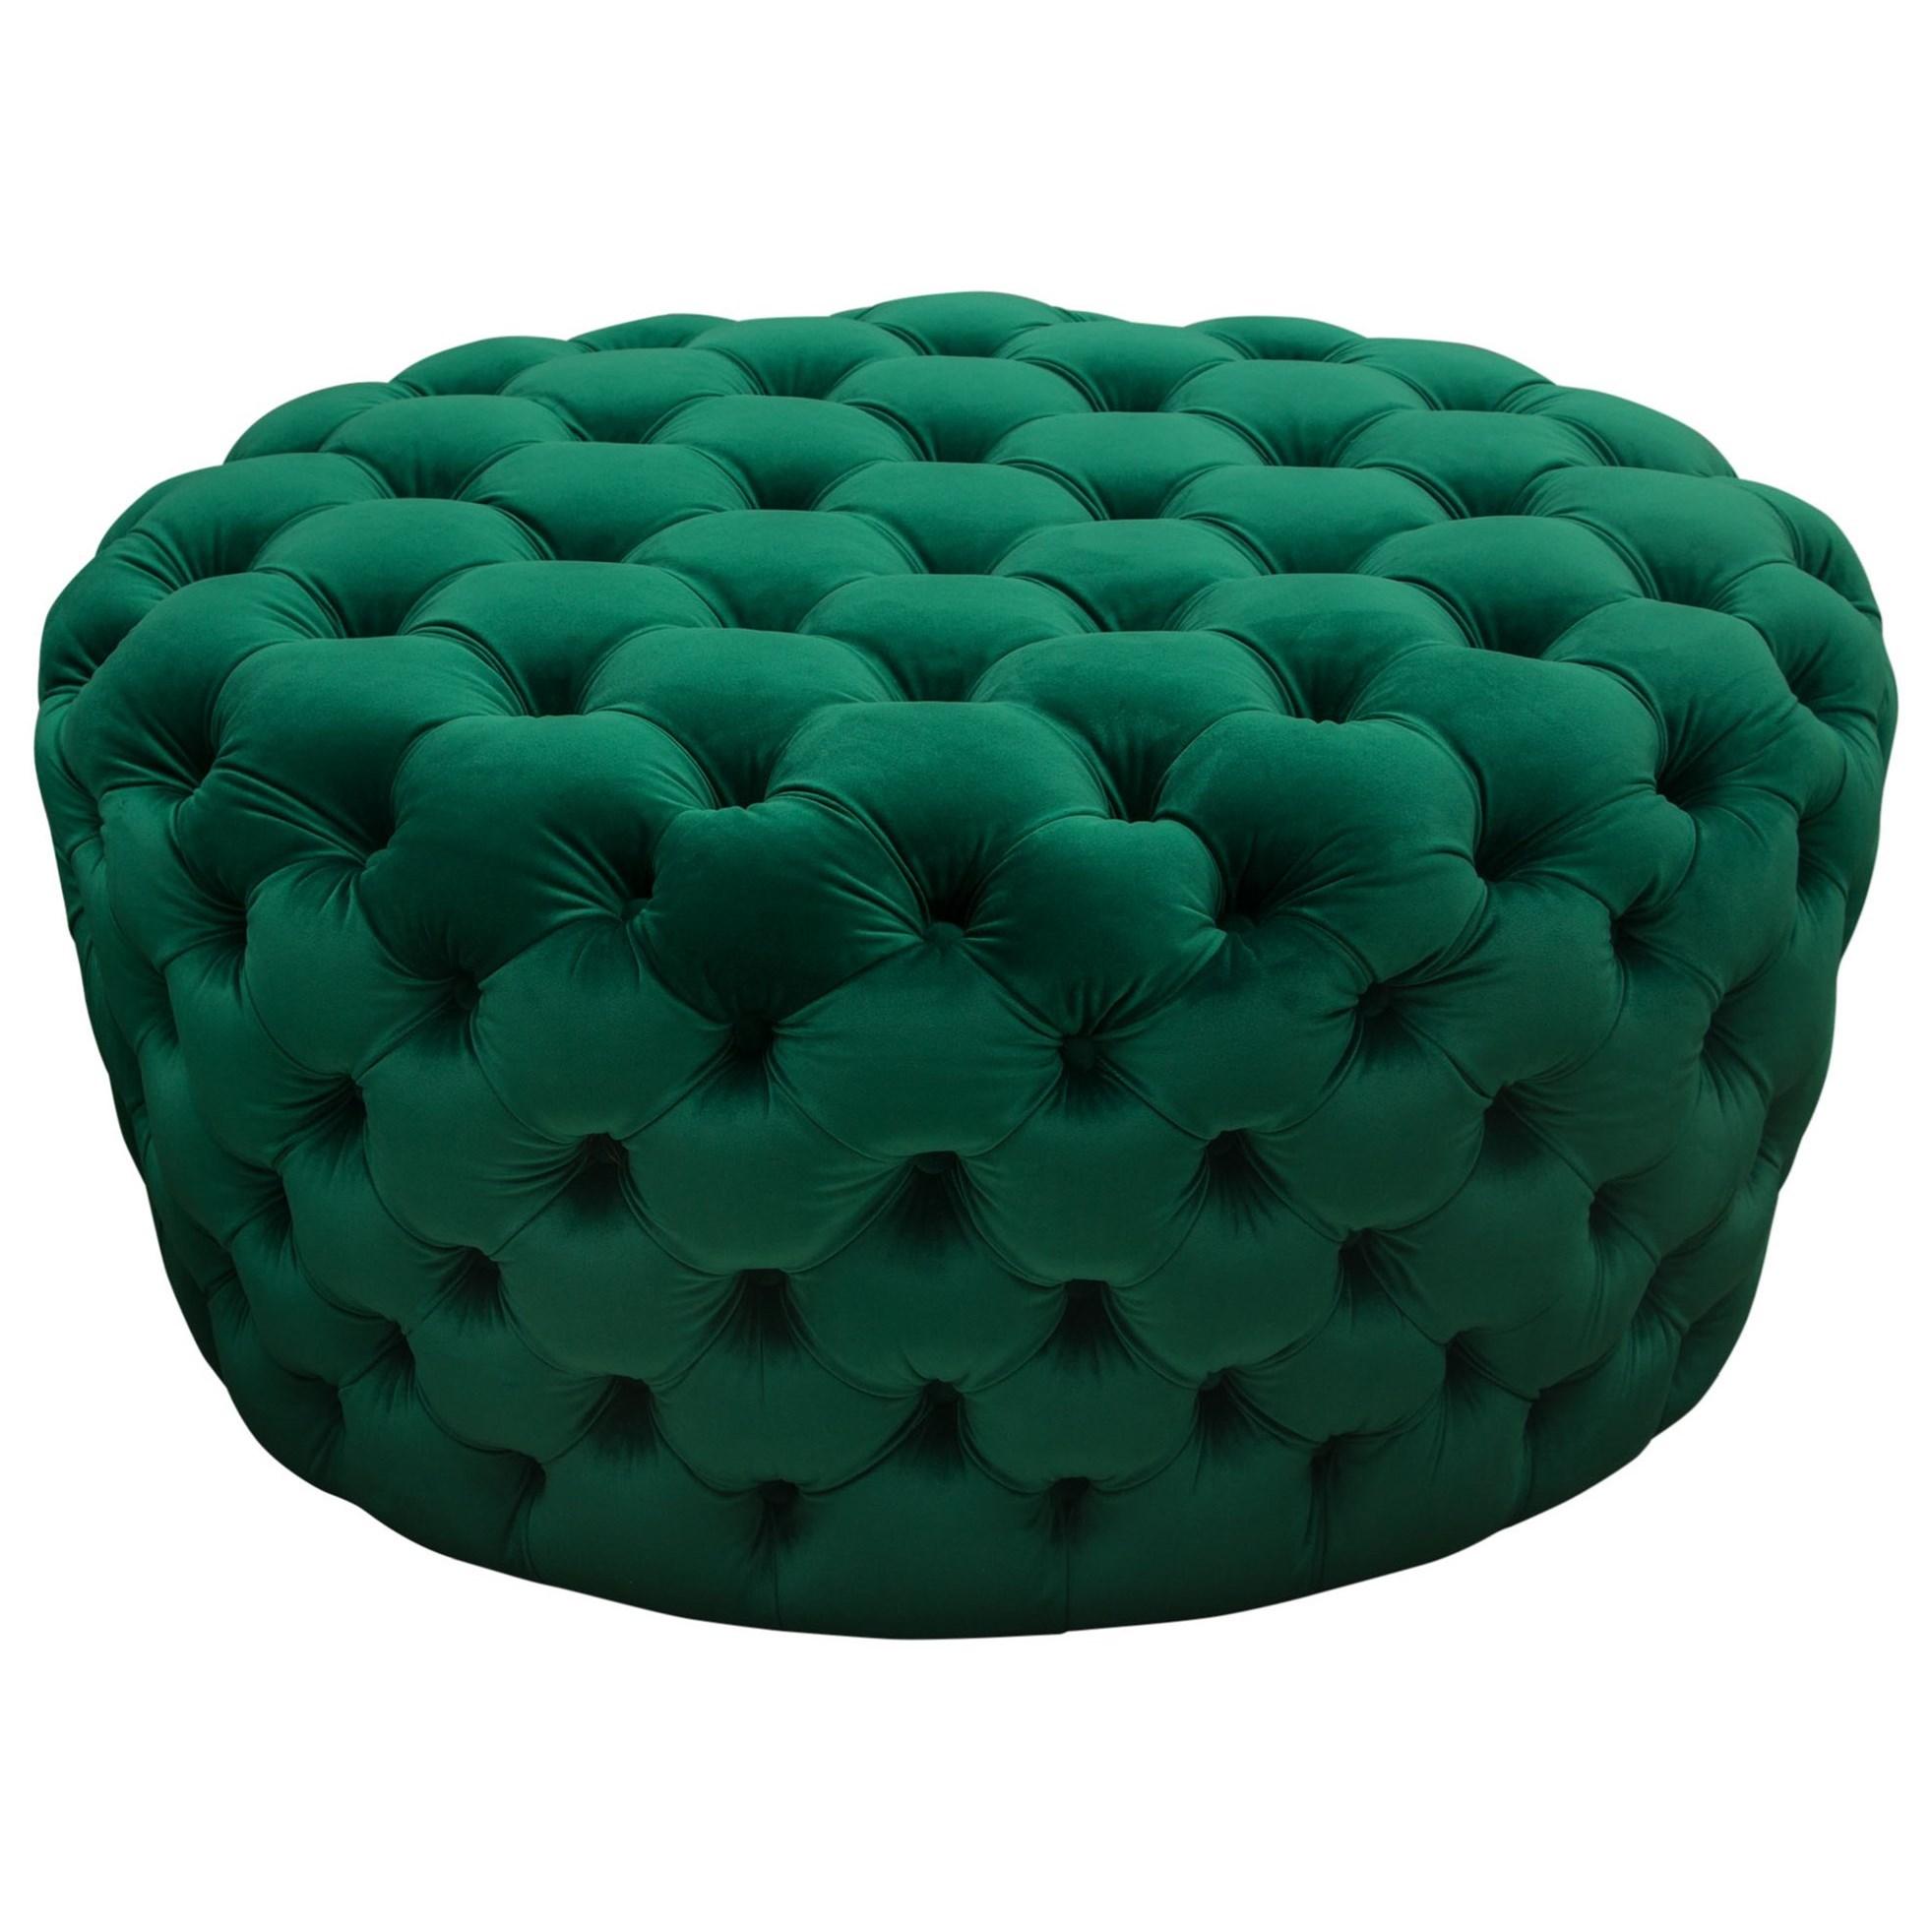 Posh Ottoman by Diamond Sofa at HomeWorld Furniture